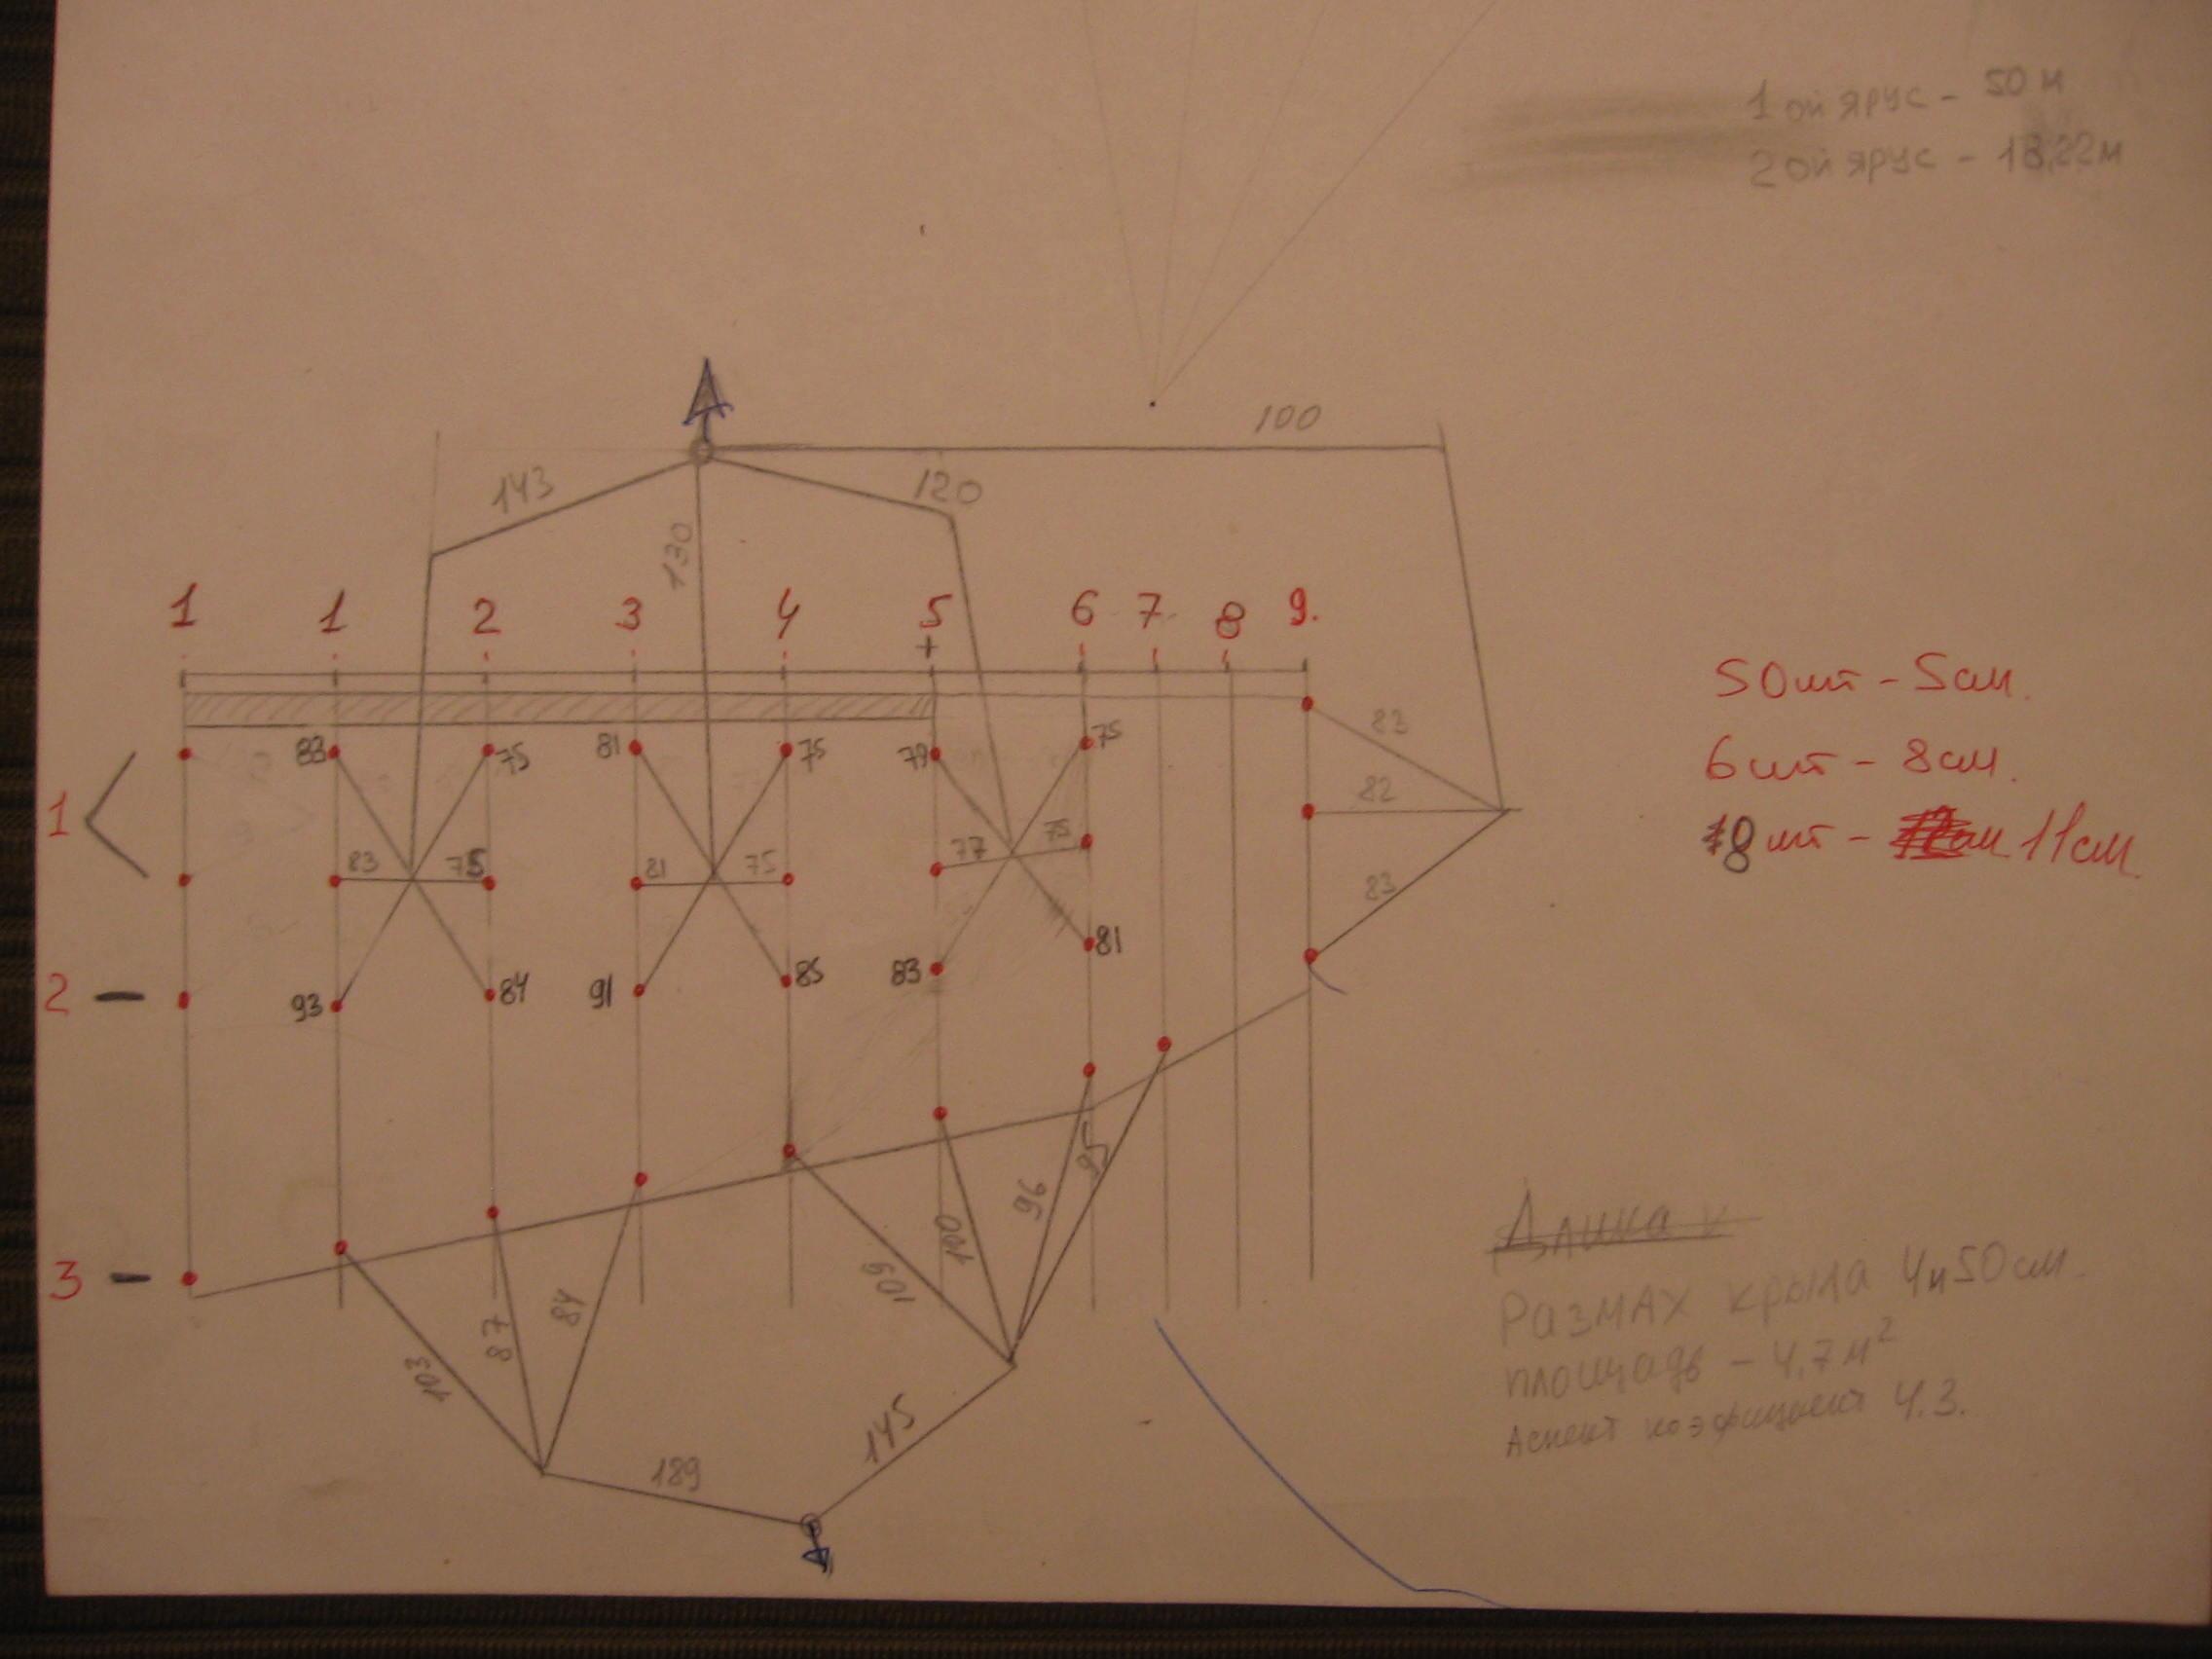 http://kite-skate.narod.ru/goodwing/1goodwing.JPG